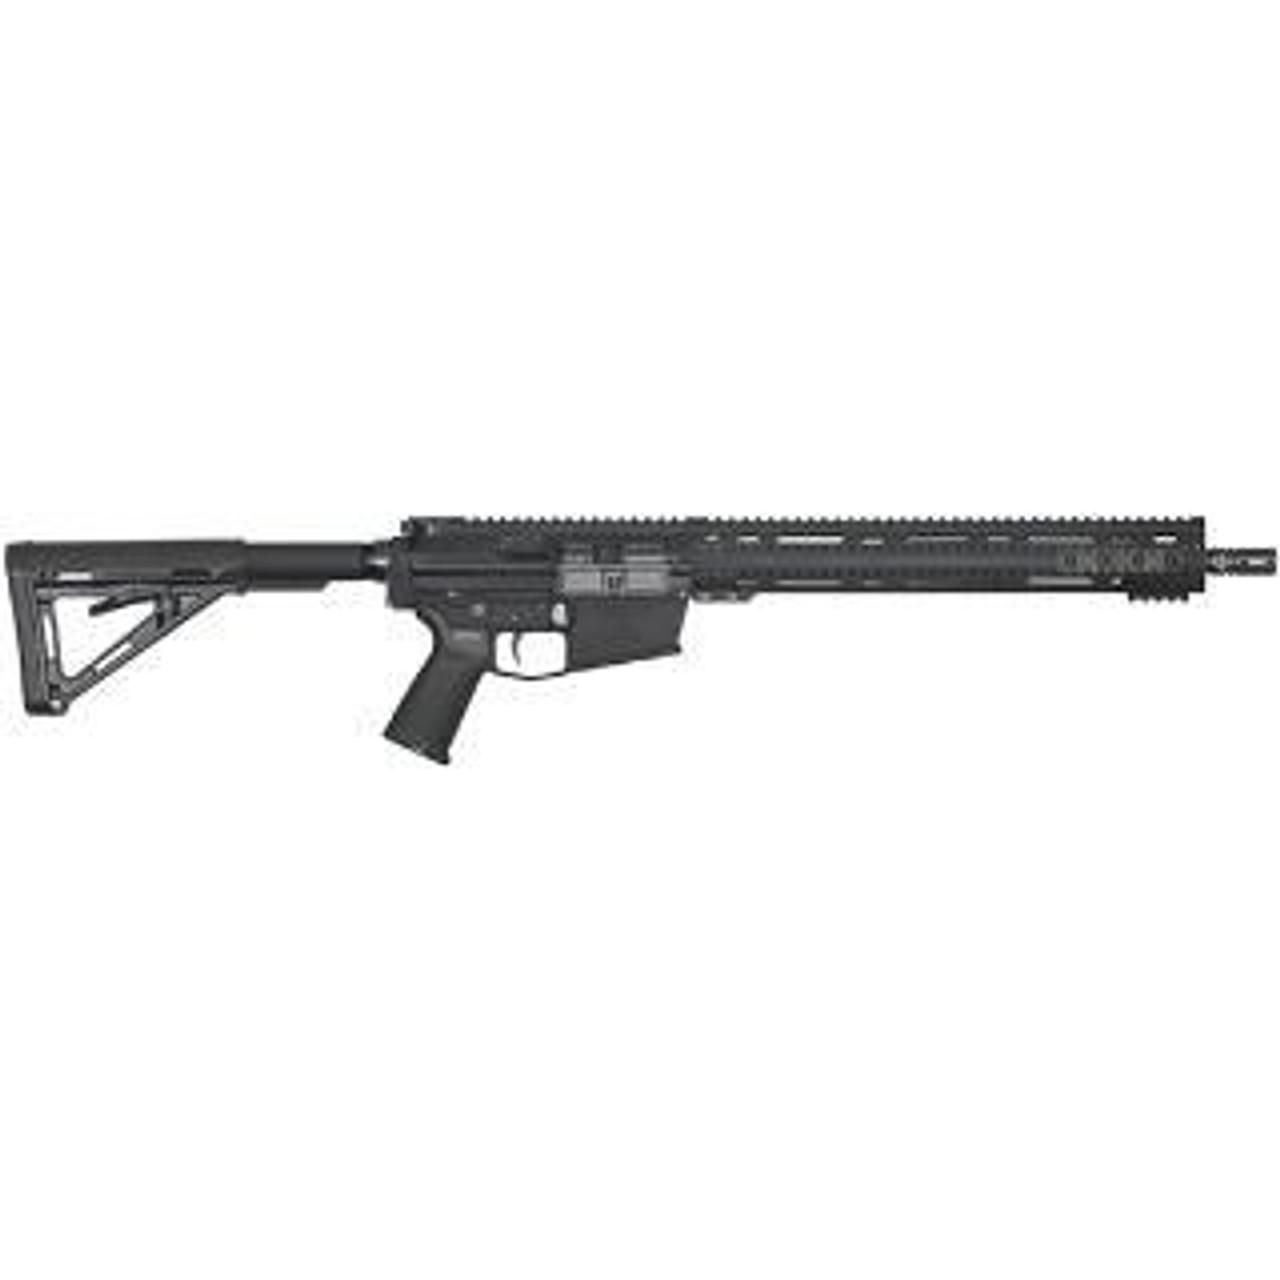 APF 308 Carbine CALIFORNIA LEGAL With- .308/7.62x51